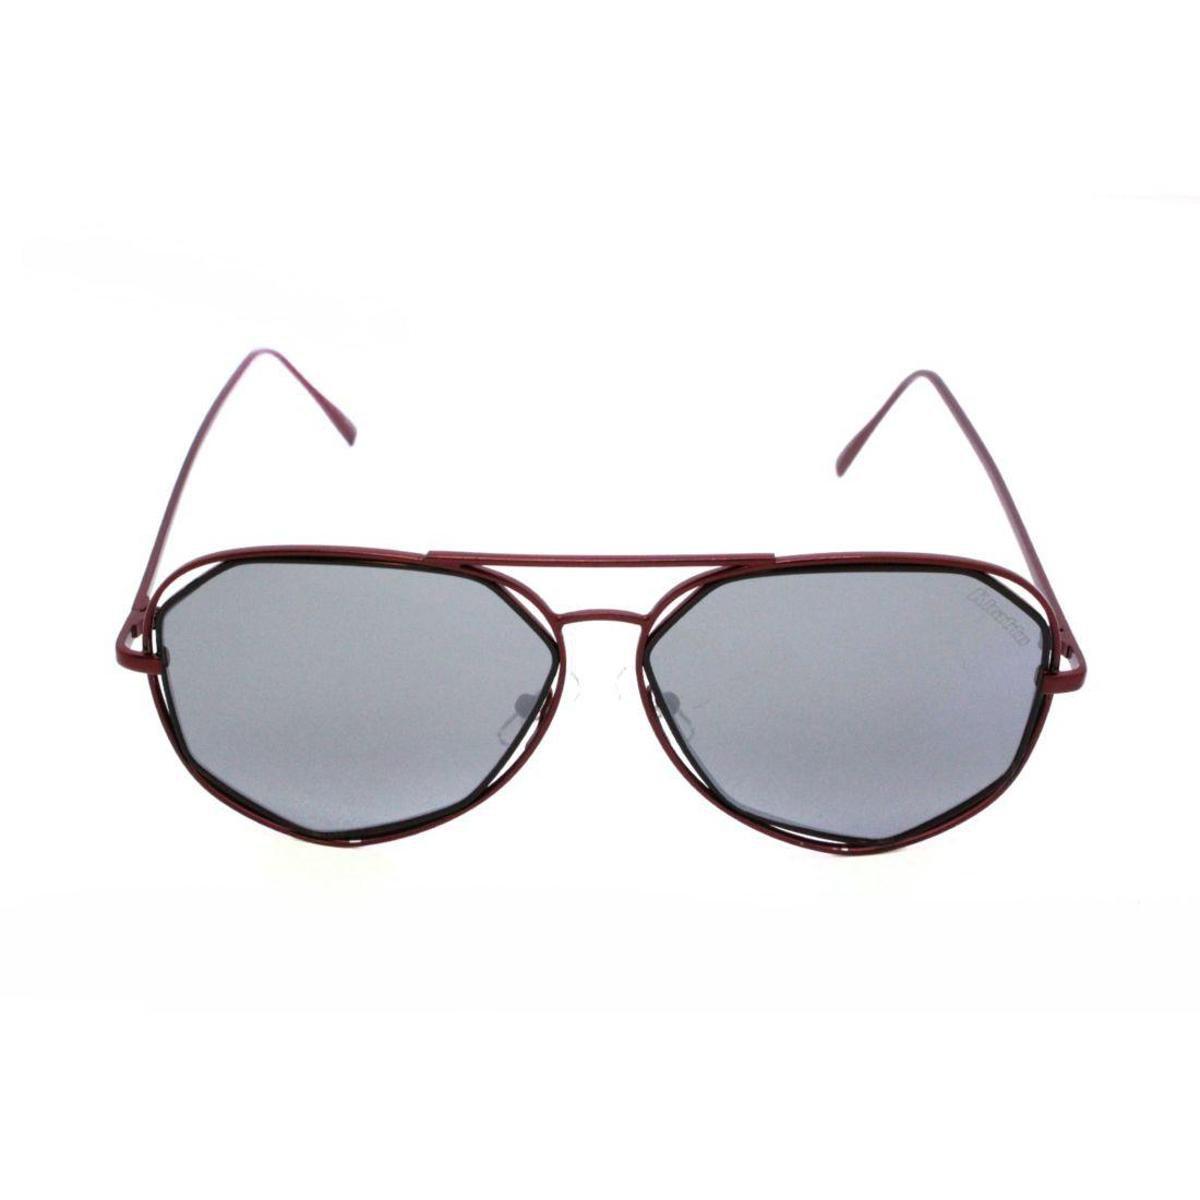 1ea227b50ffbb Óculos de Sol Khatto Aviador Wire - Vinho - Compre Agora